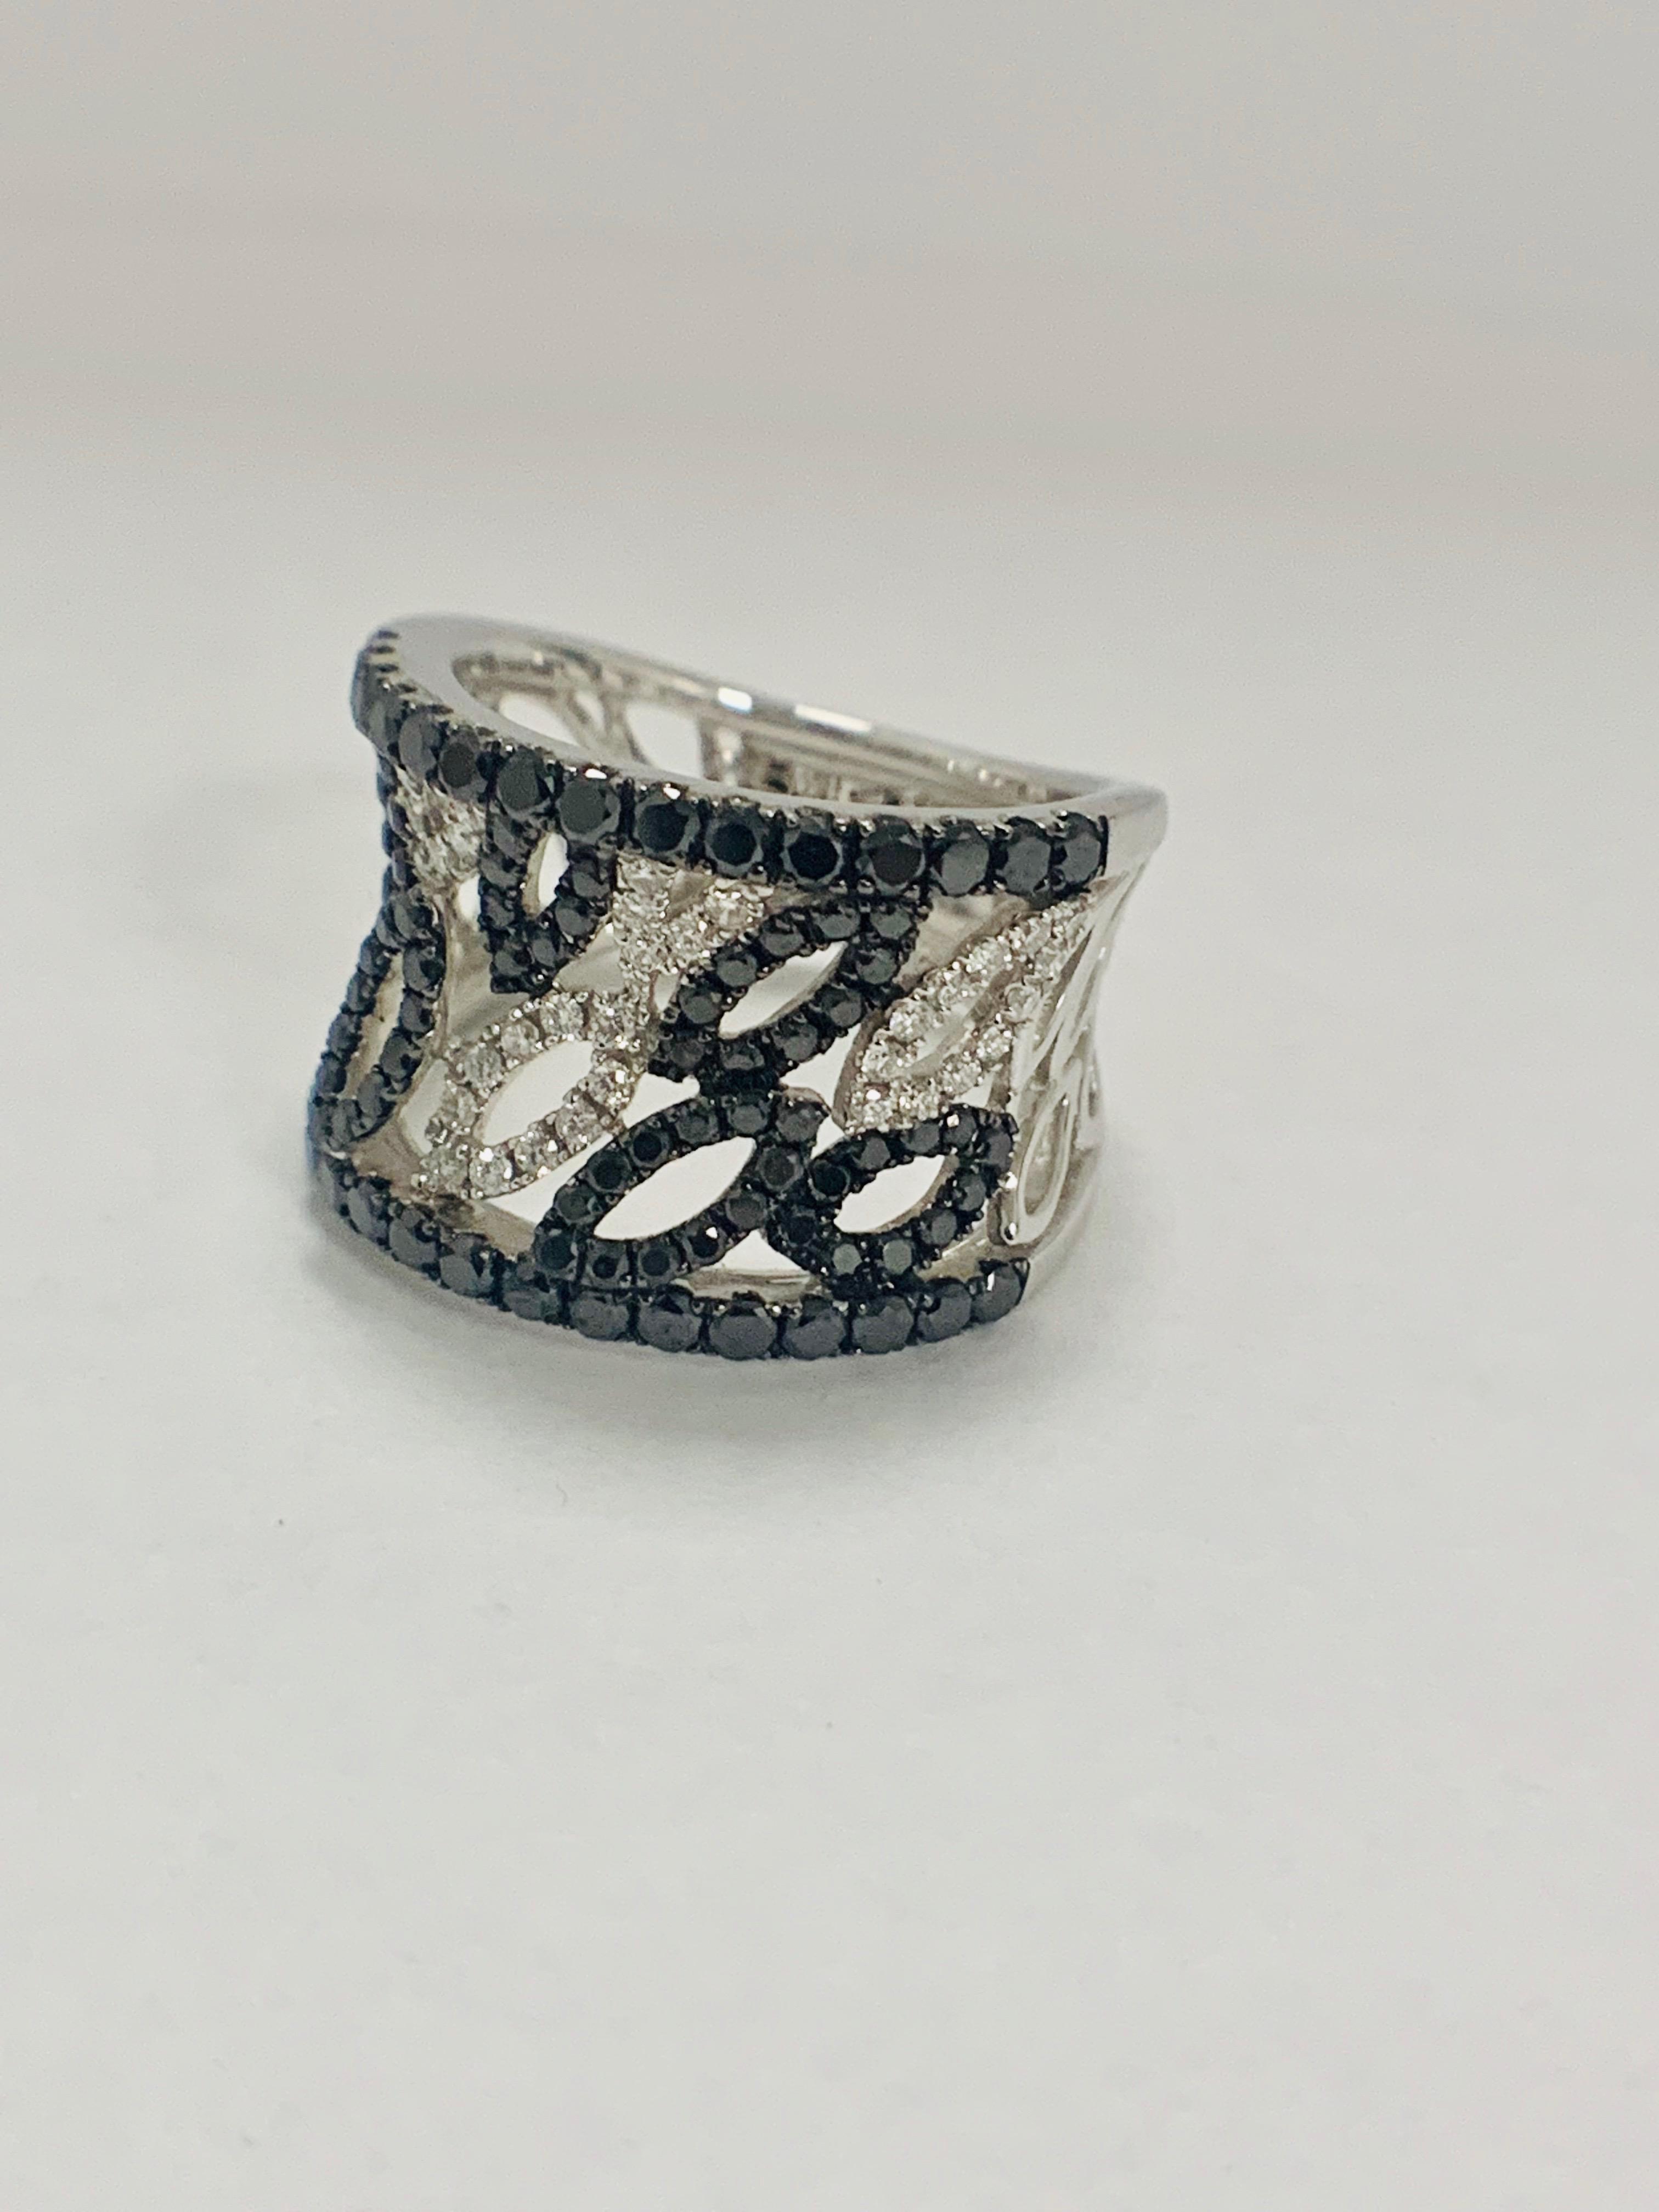 18ct White Gold Diamond ring featuring 90 round cut, black Diamonds (1.14ct TBDW) - Image 5 of 15